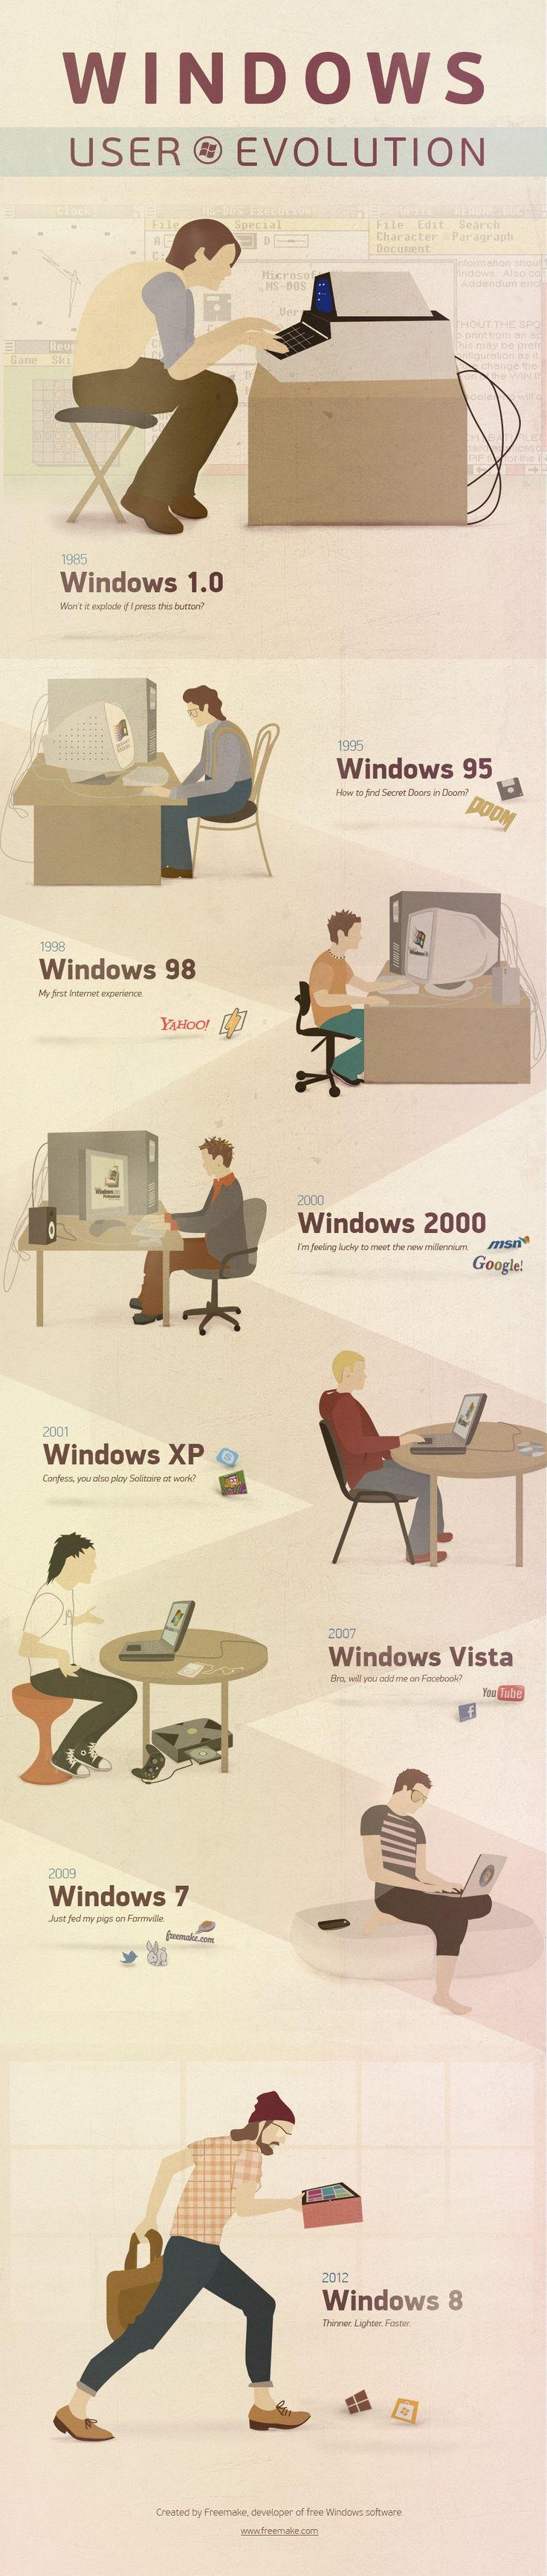 The Evolution of Windows